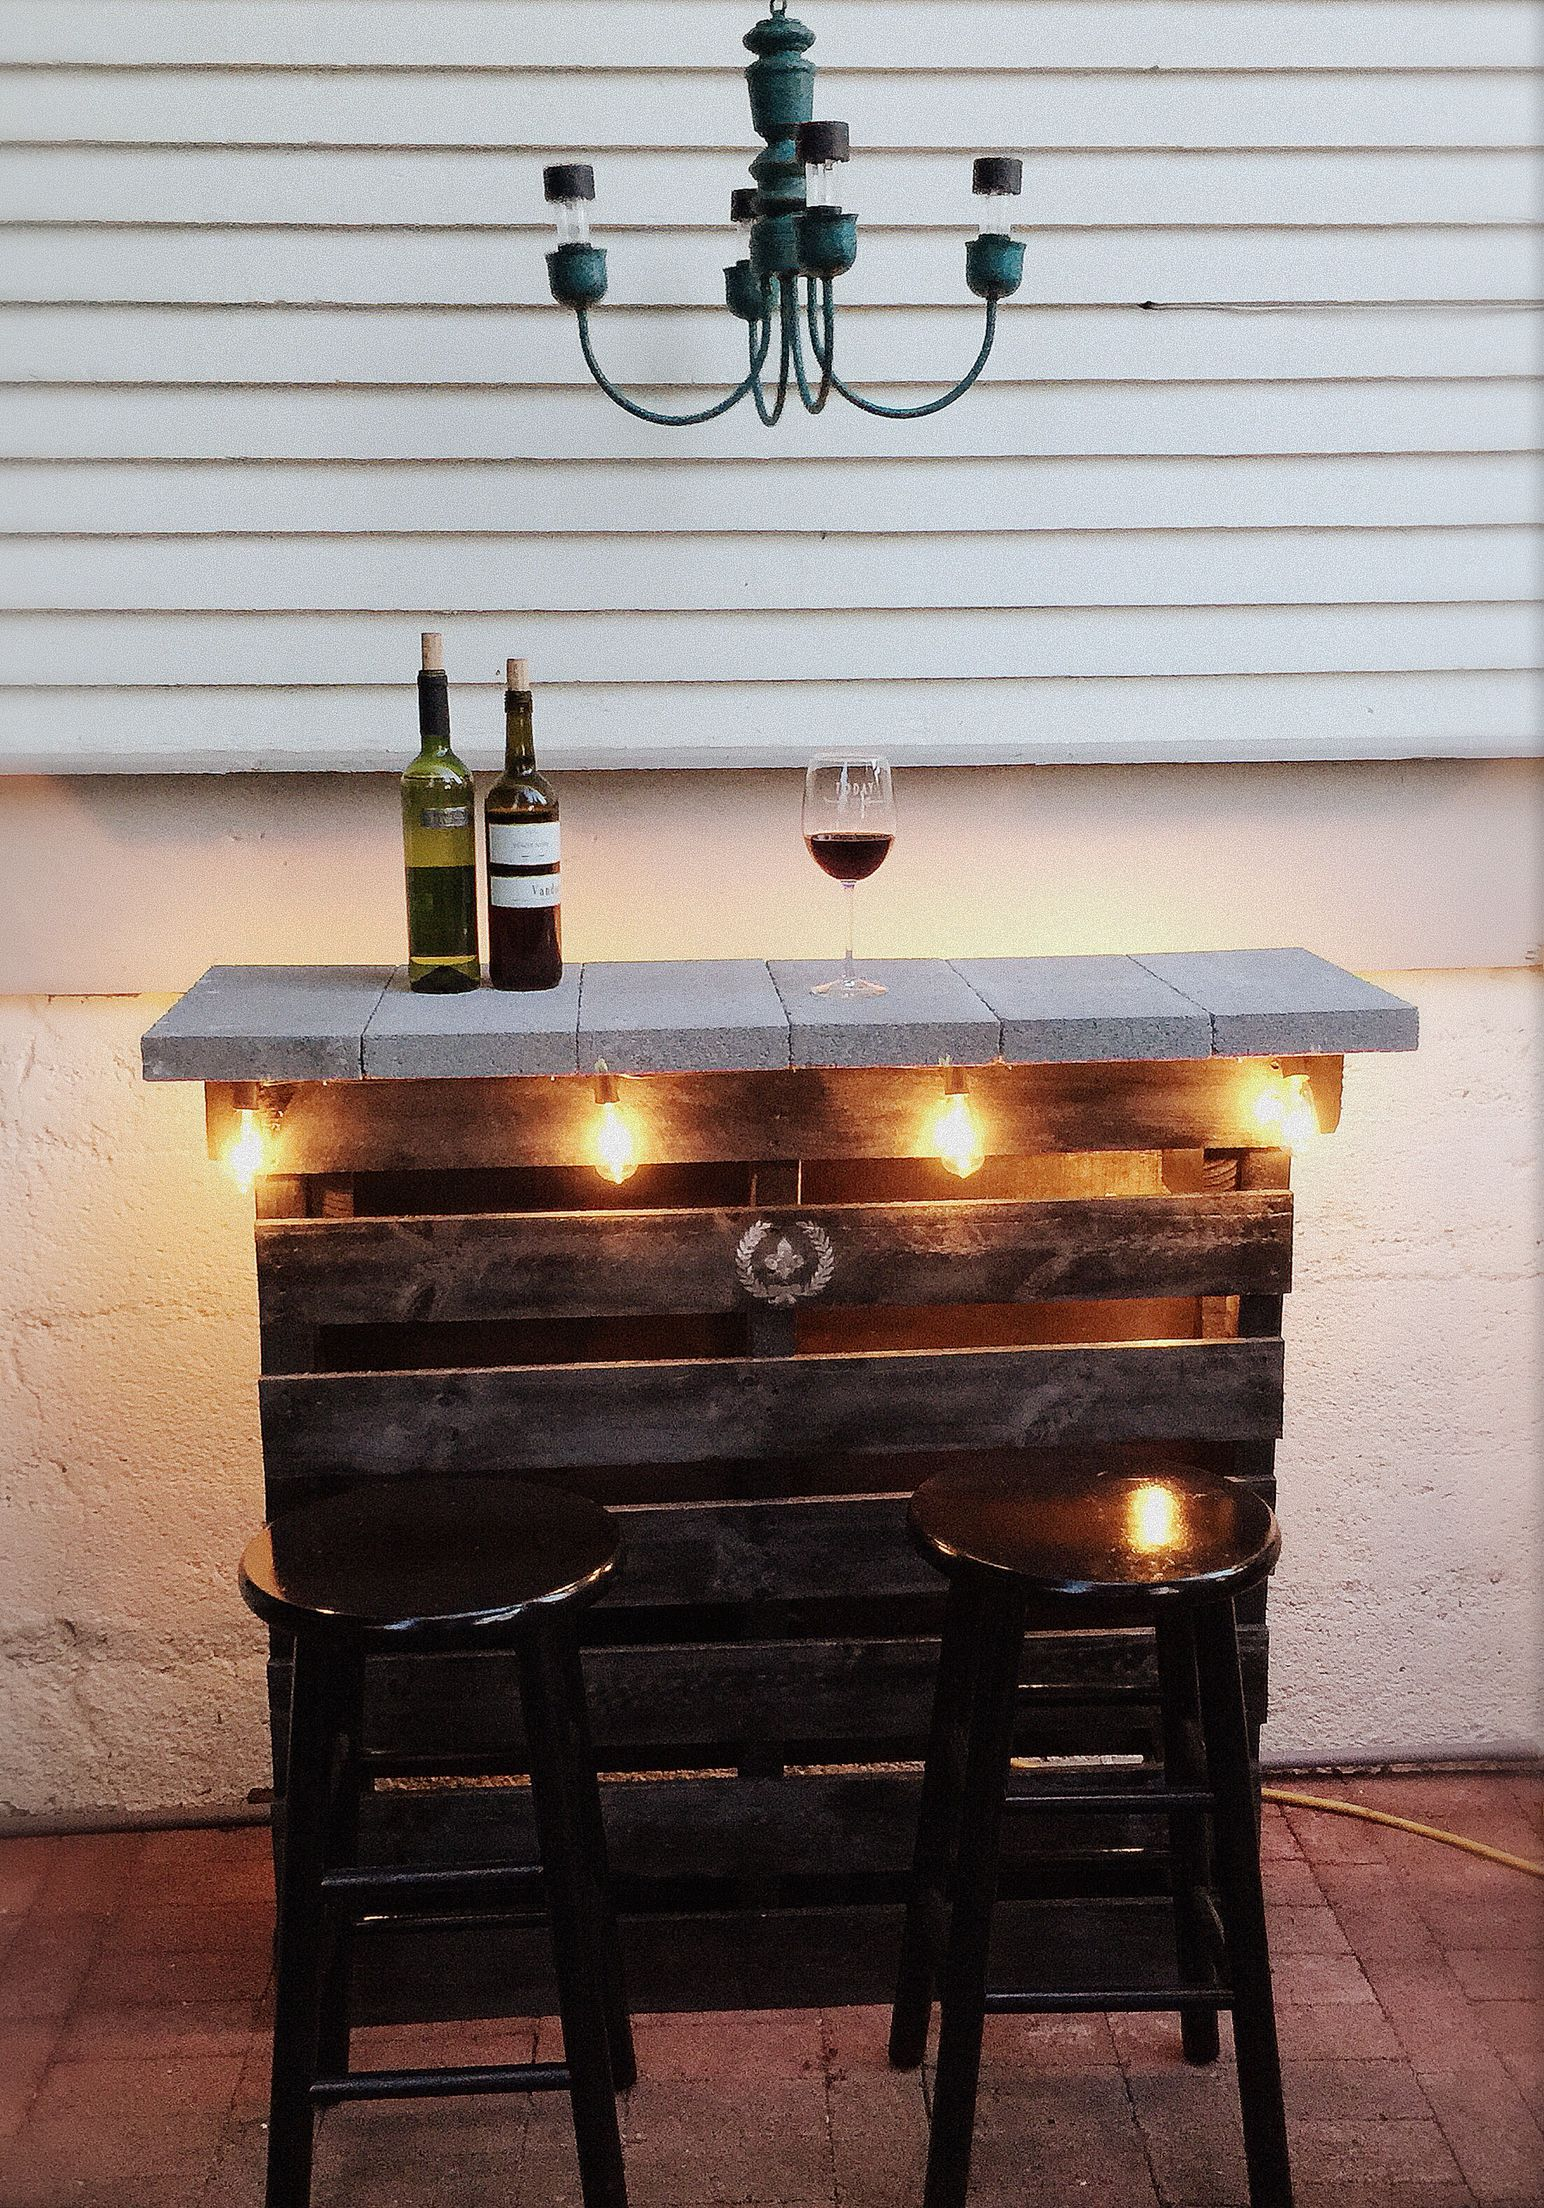 Diy Patio Bar Ideas: DIY Patio Pallet Bar: Screw Together 2 Pallets, Spray